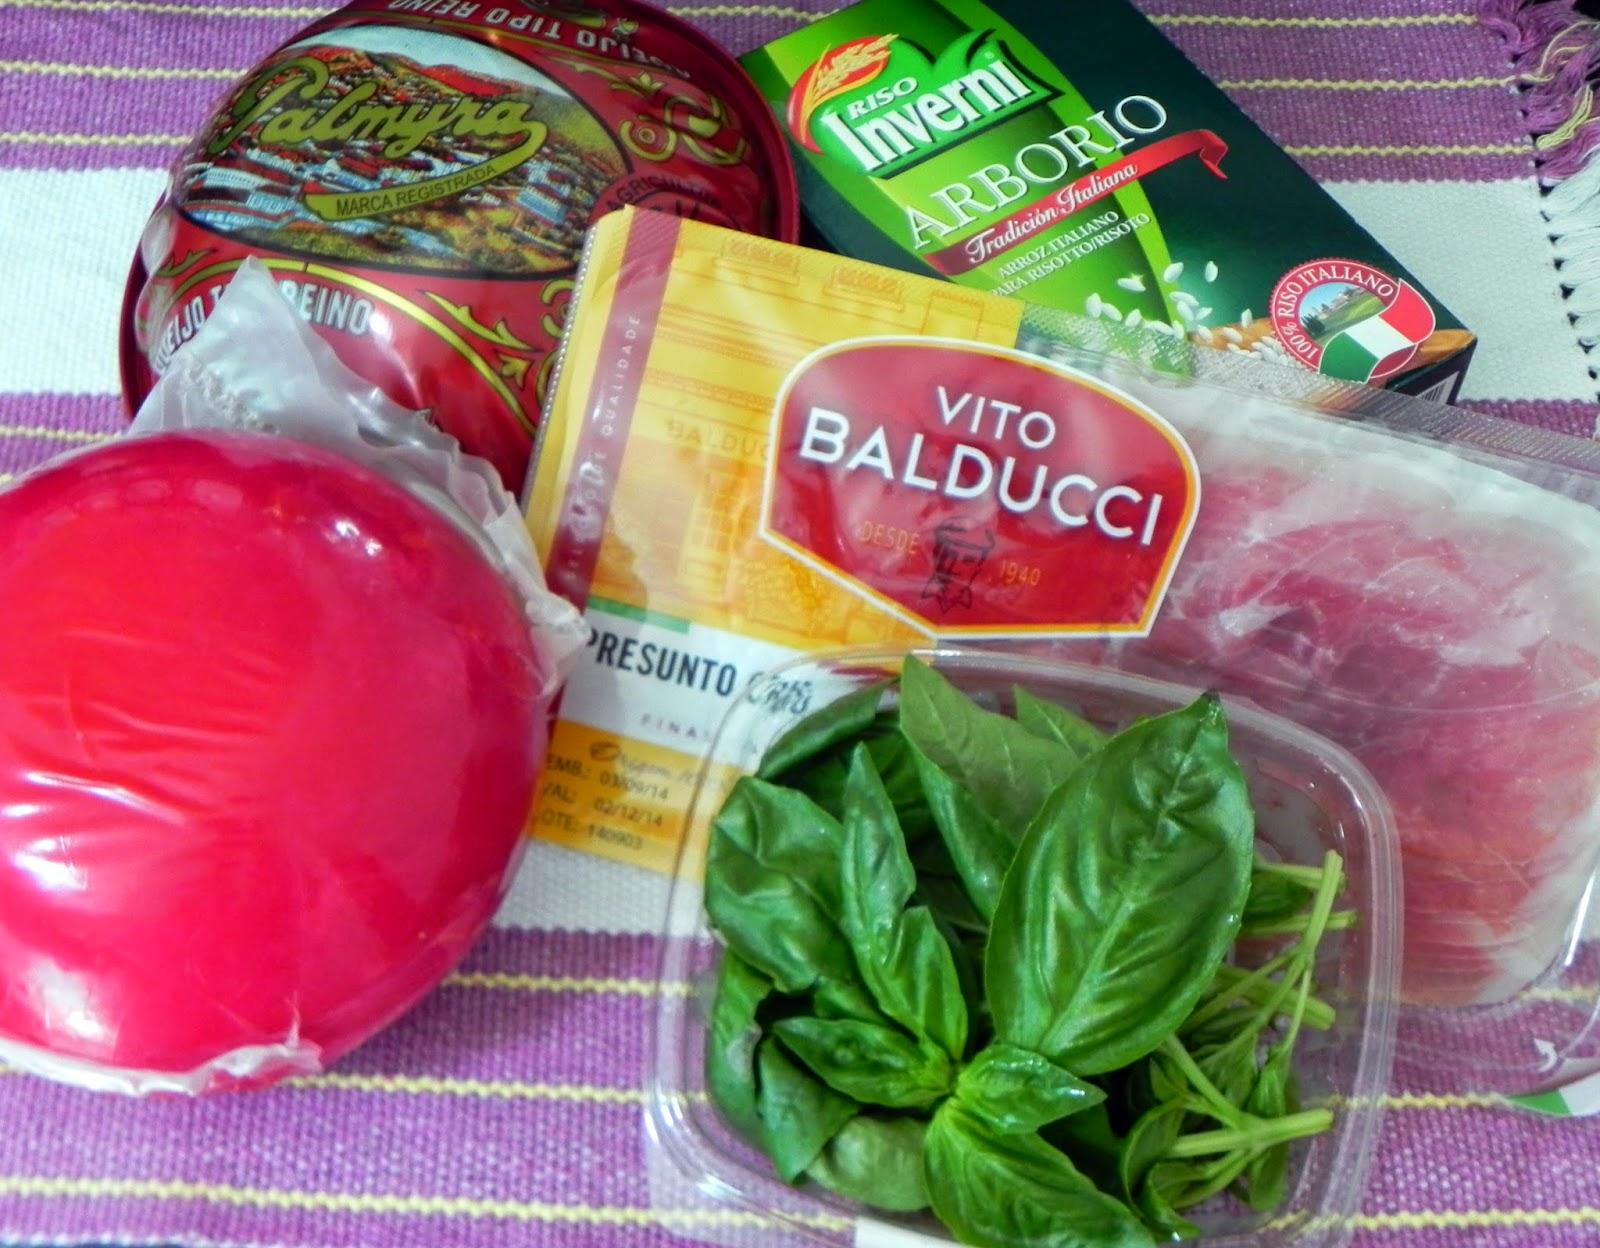 Ingredientes Queijo Manjericão Presunto Cru Arroz Arbóreo